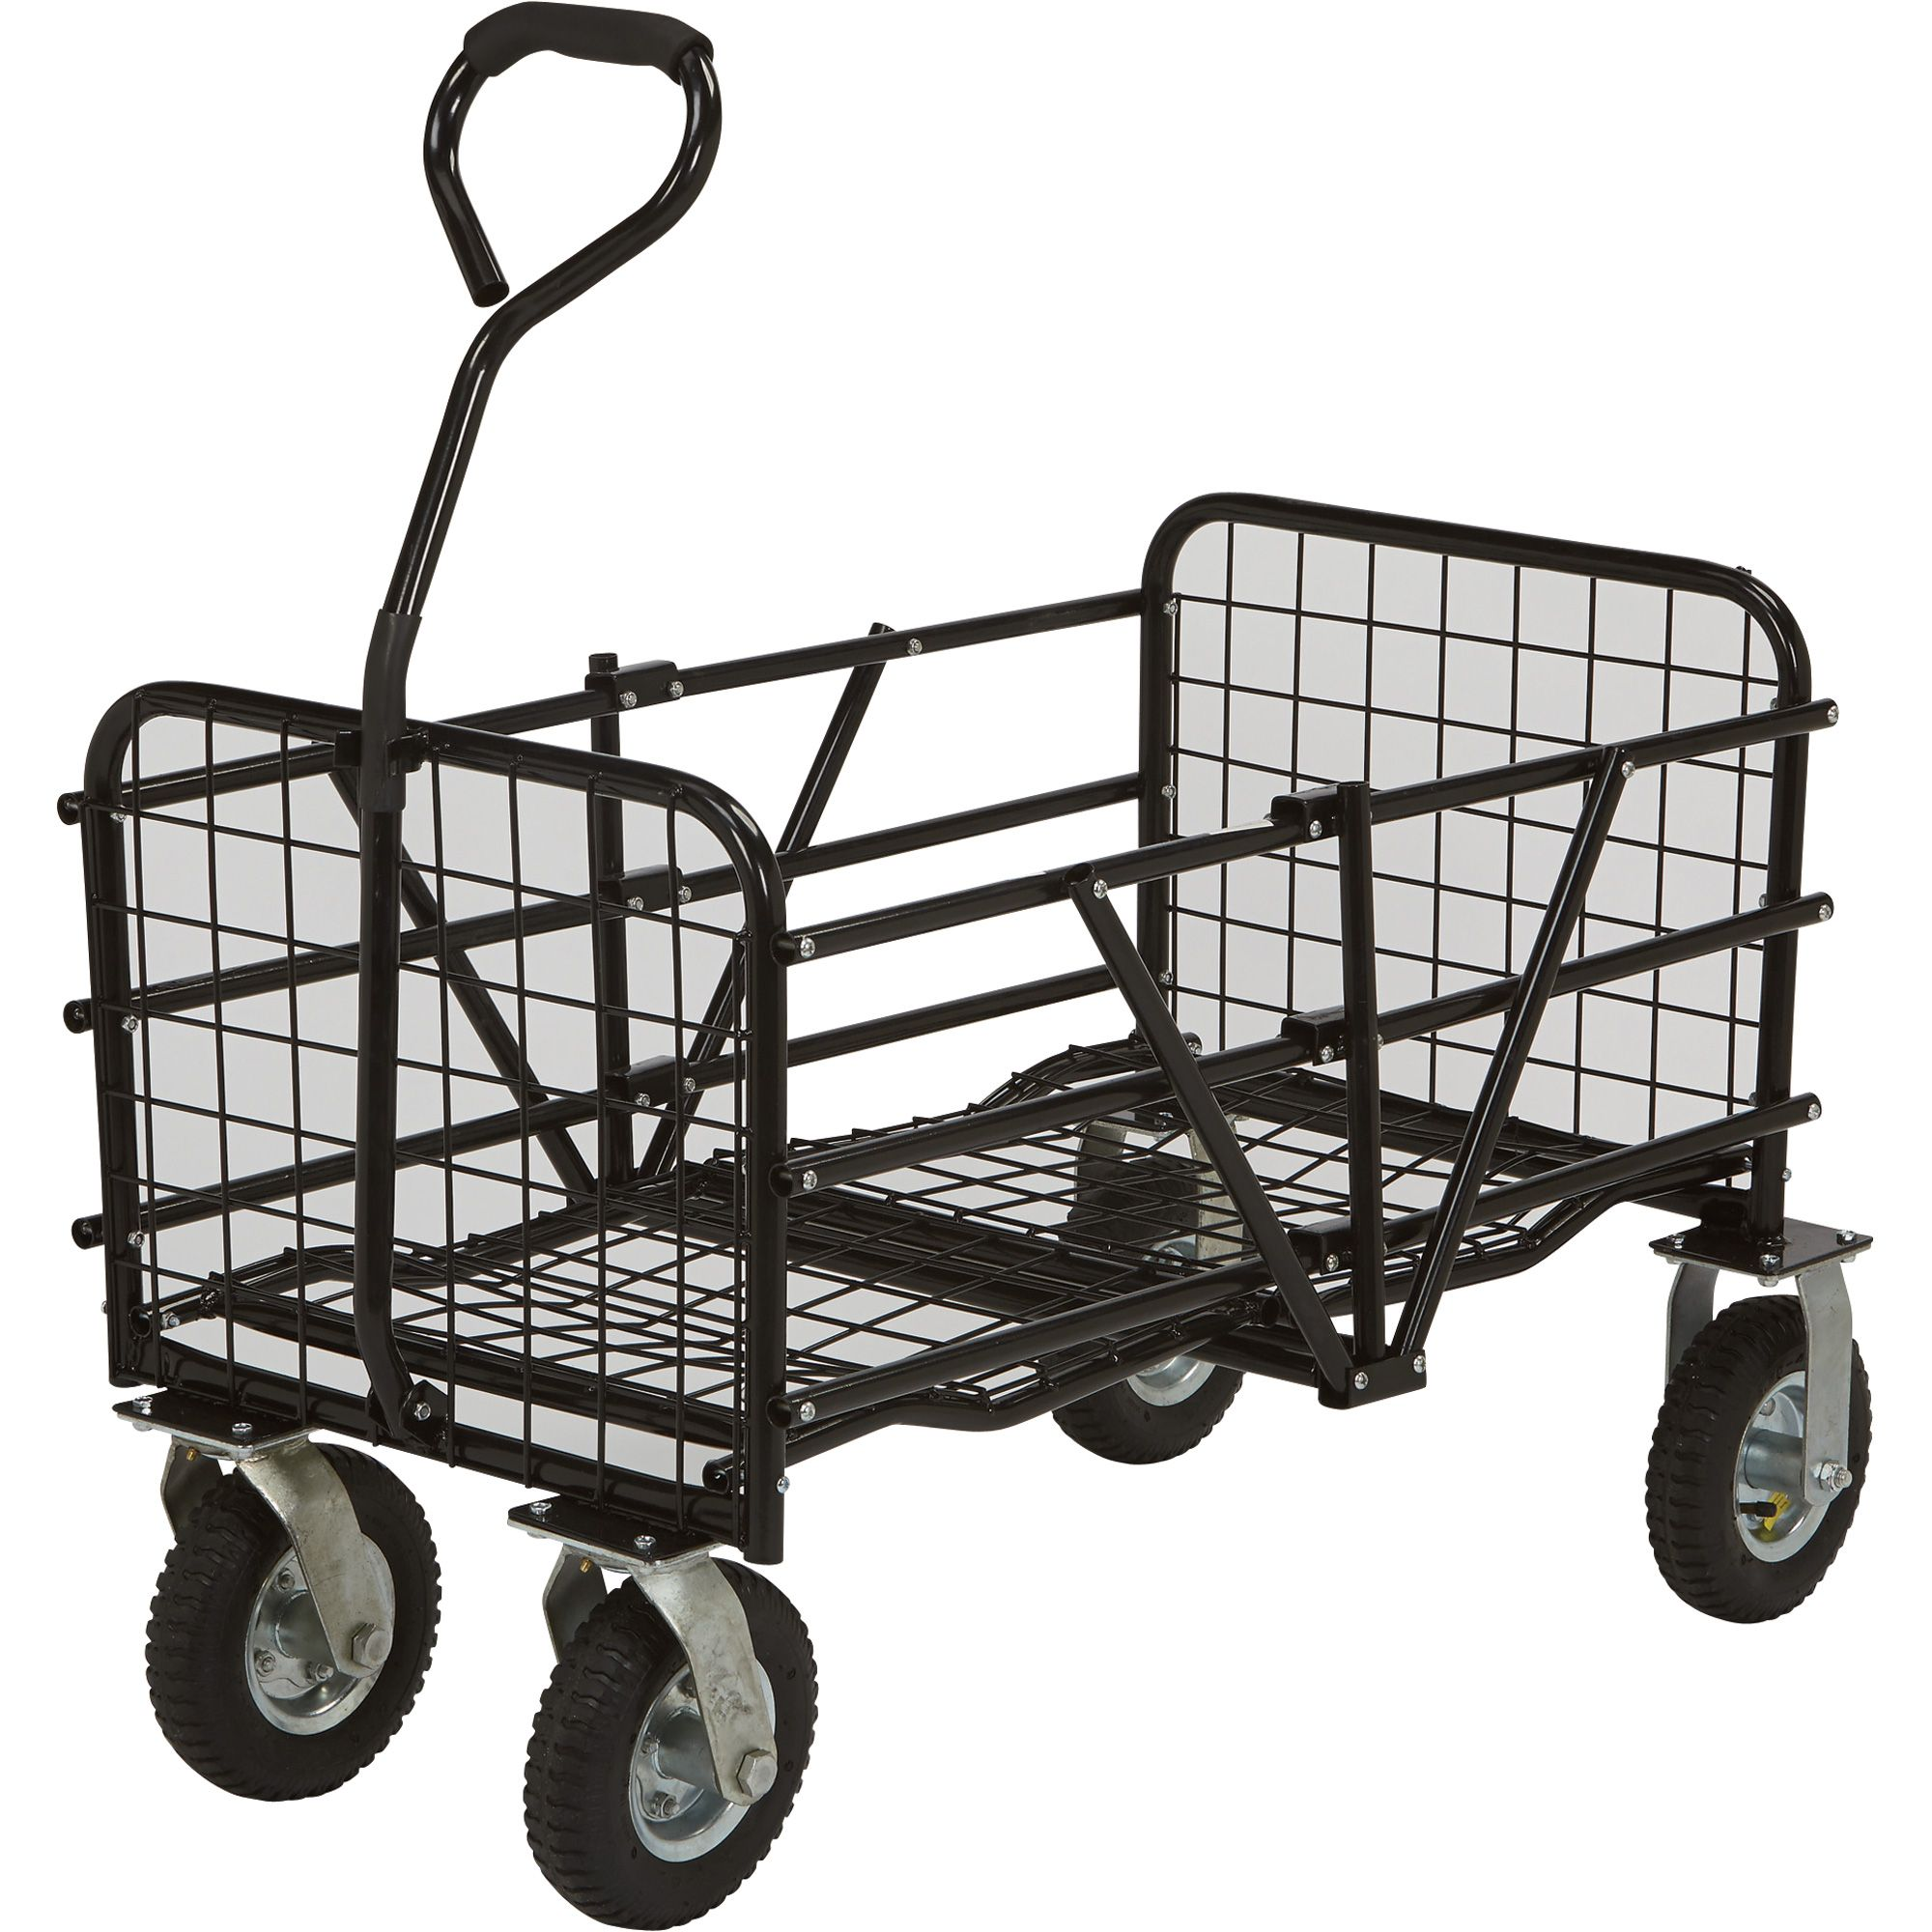 Strongway Folding Utility Cart U2014 49in.L X 25 1/2in.W,